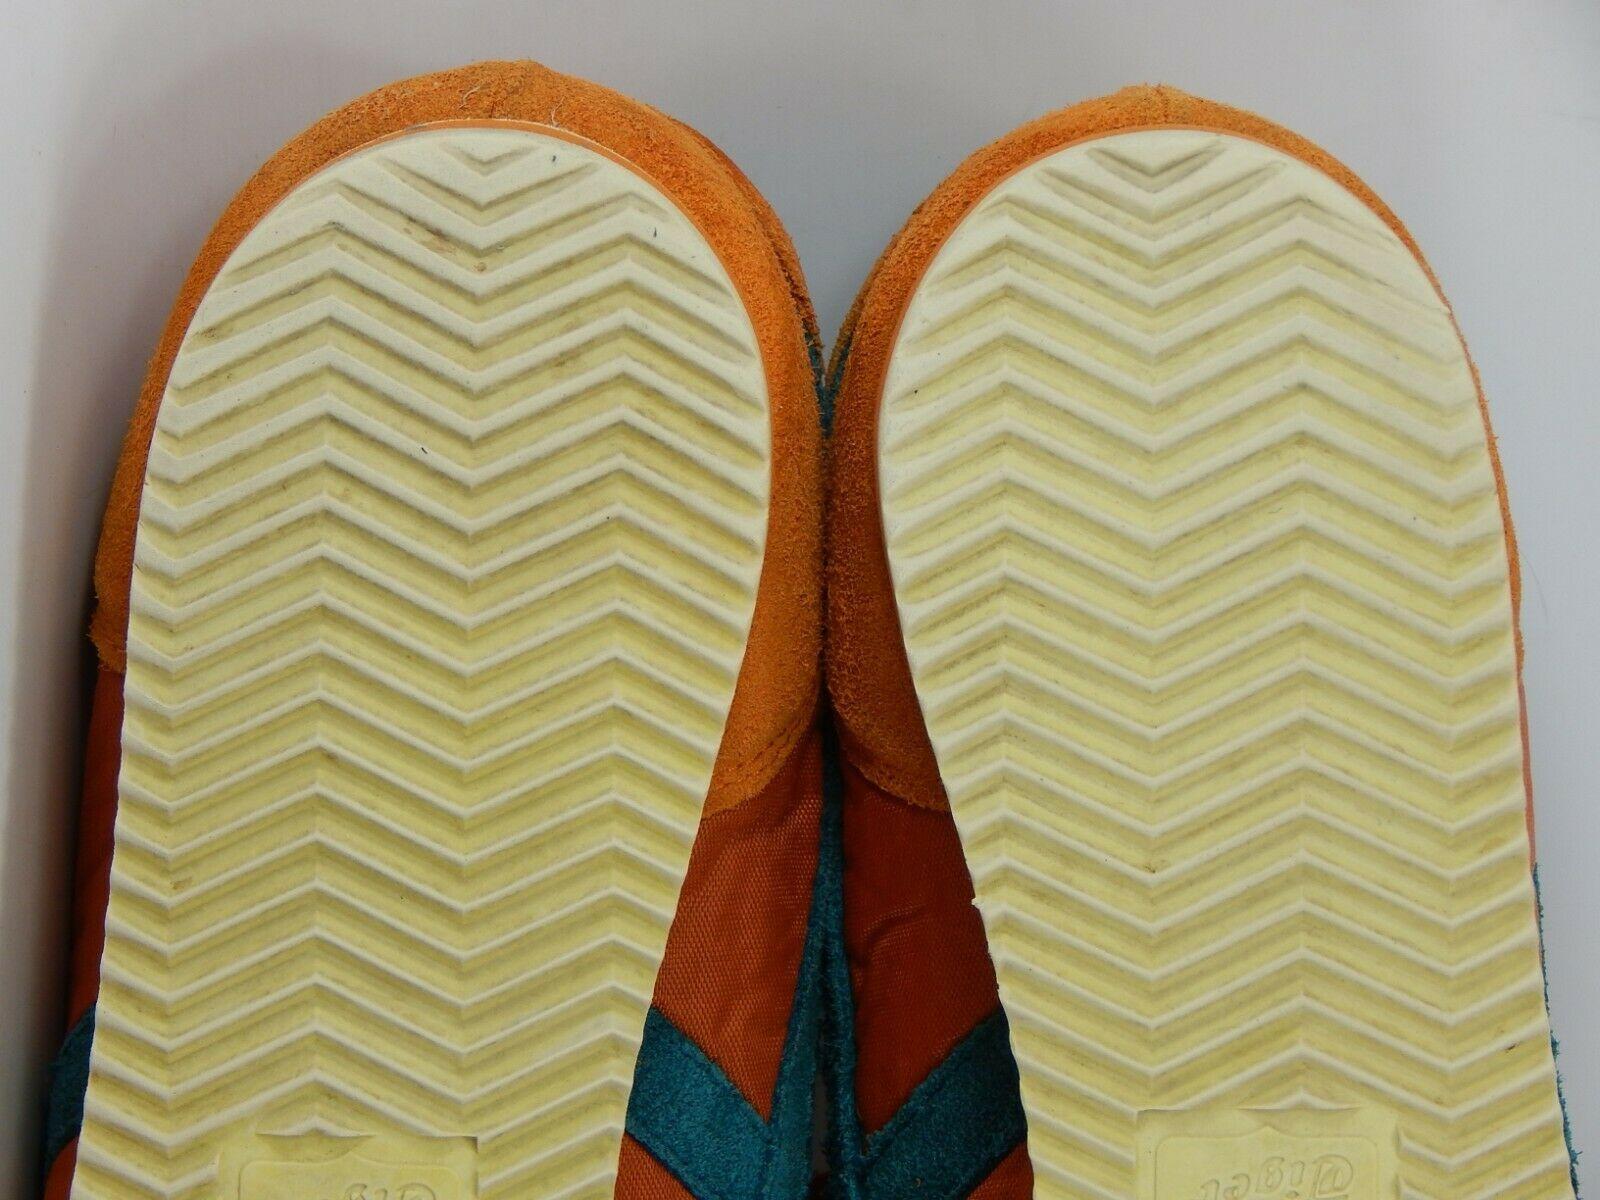 Asics Onitsuka Tiger Corsair Vin Größe US 9 M D 42.5 Herren Sneakers Schuhe